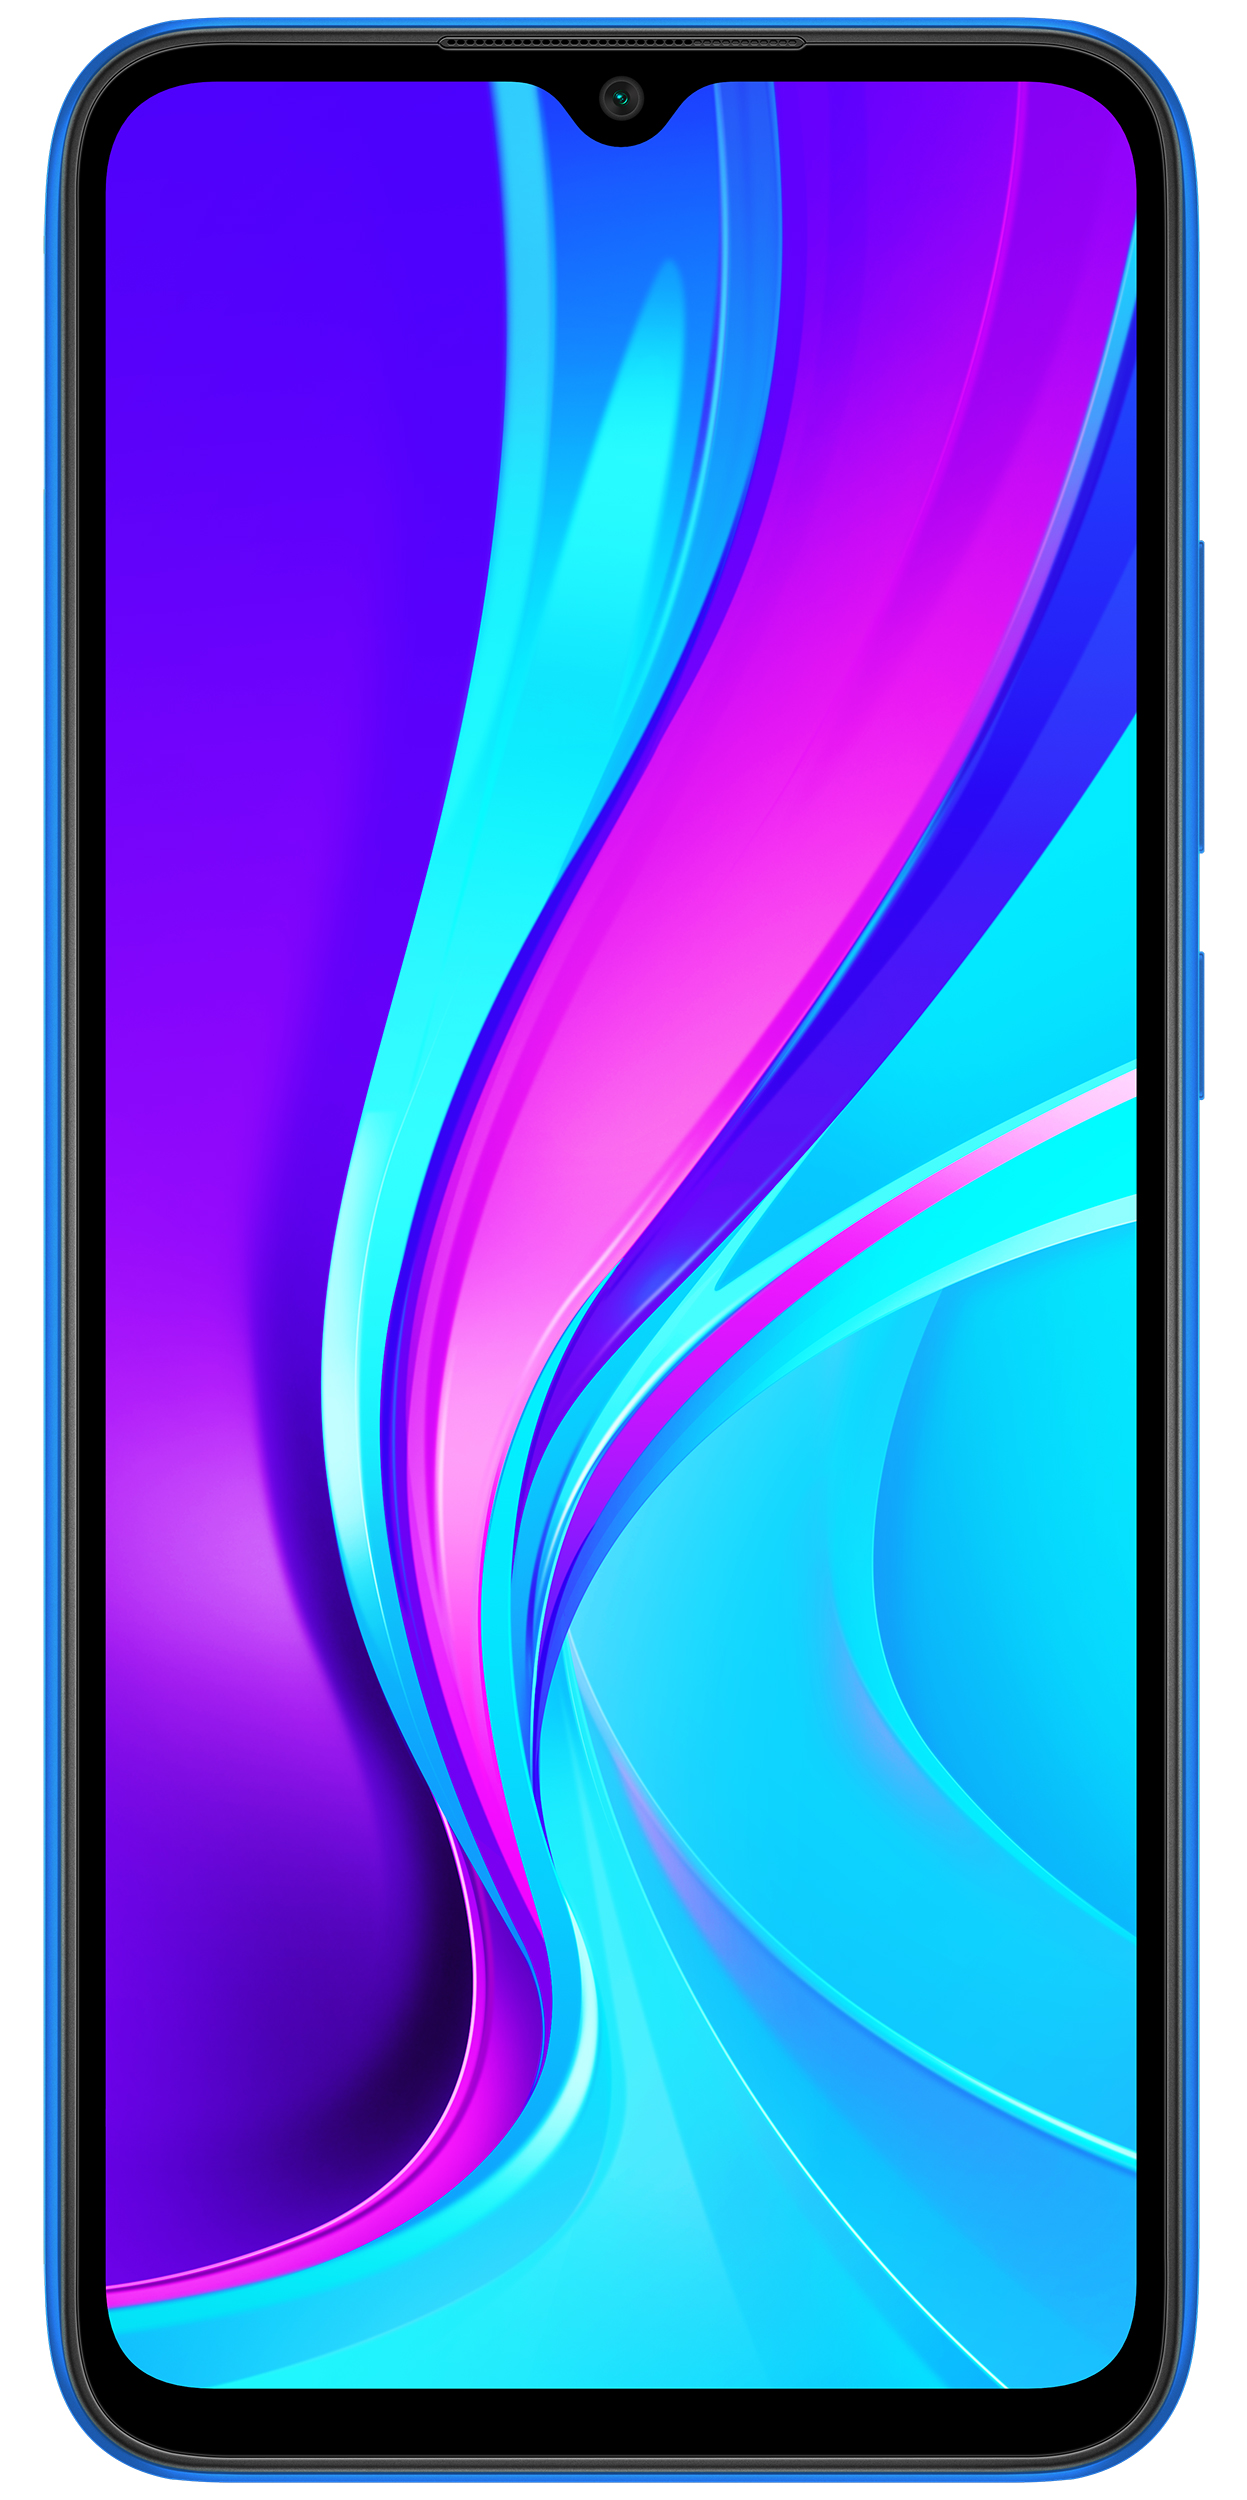 Smartphone Redmi 9C NFC - 3+64GB, Twilight Blue